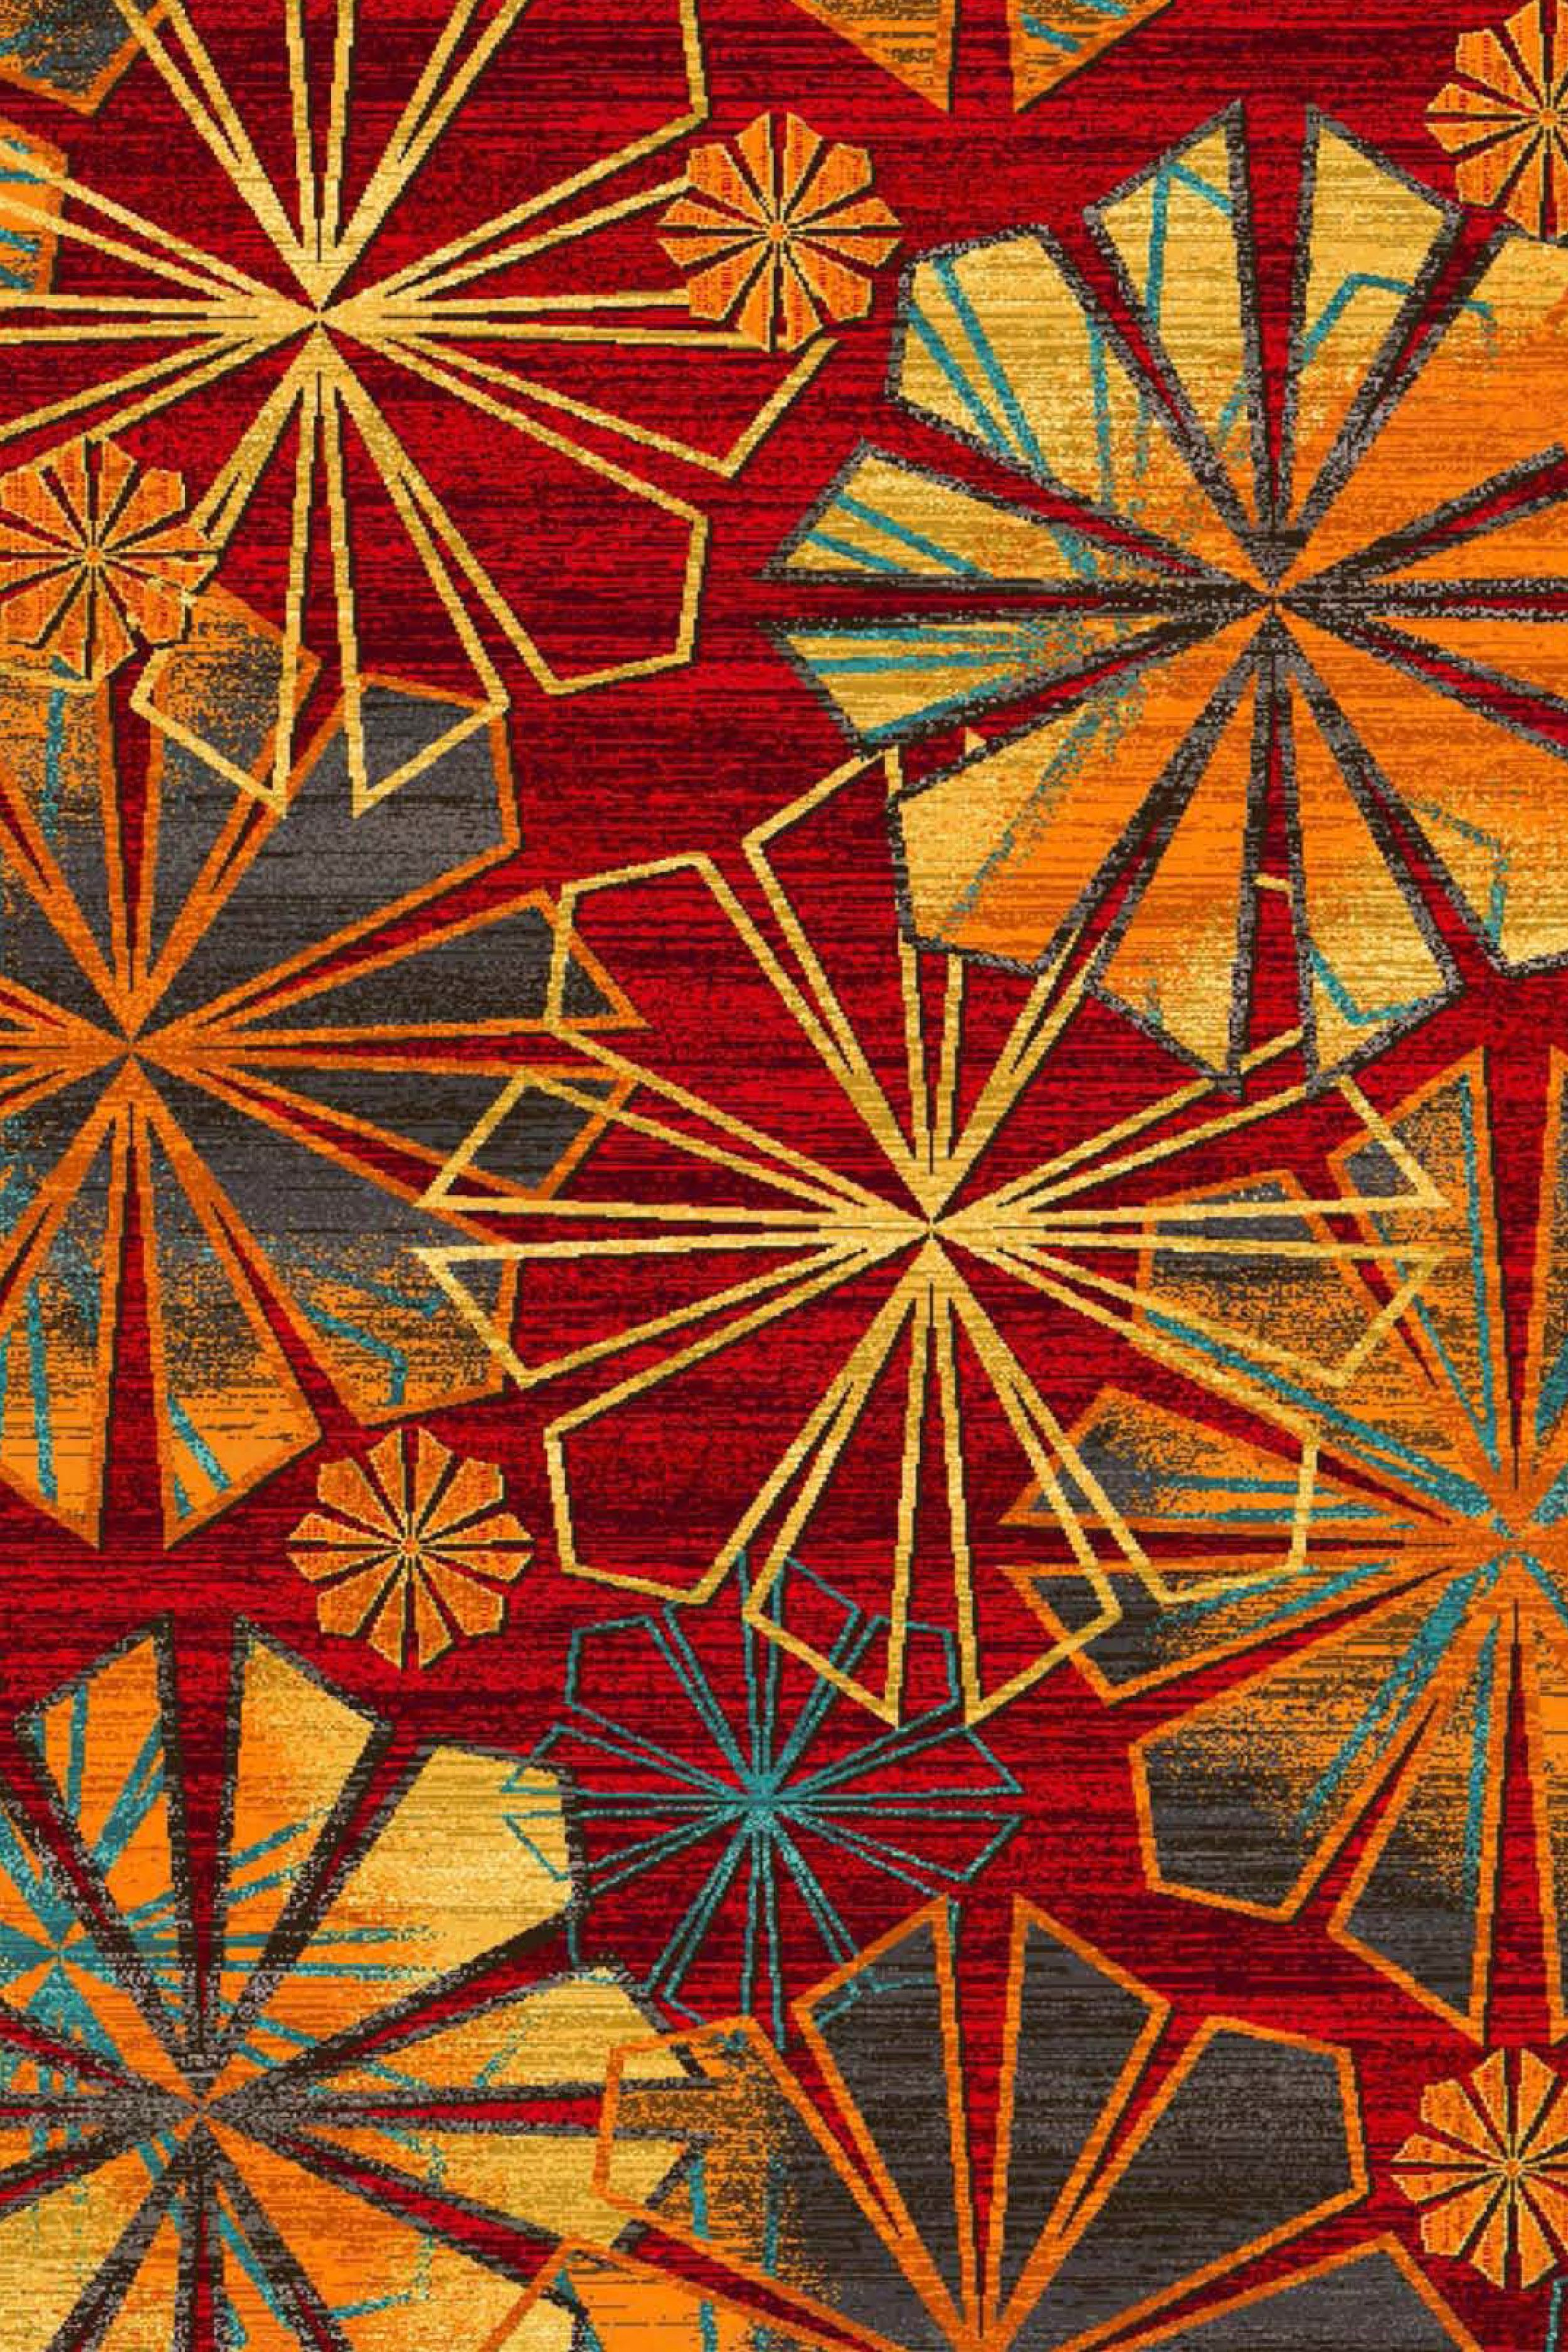 High Energy Colorful Axminster Carpet Designs For Casino